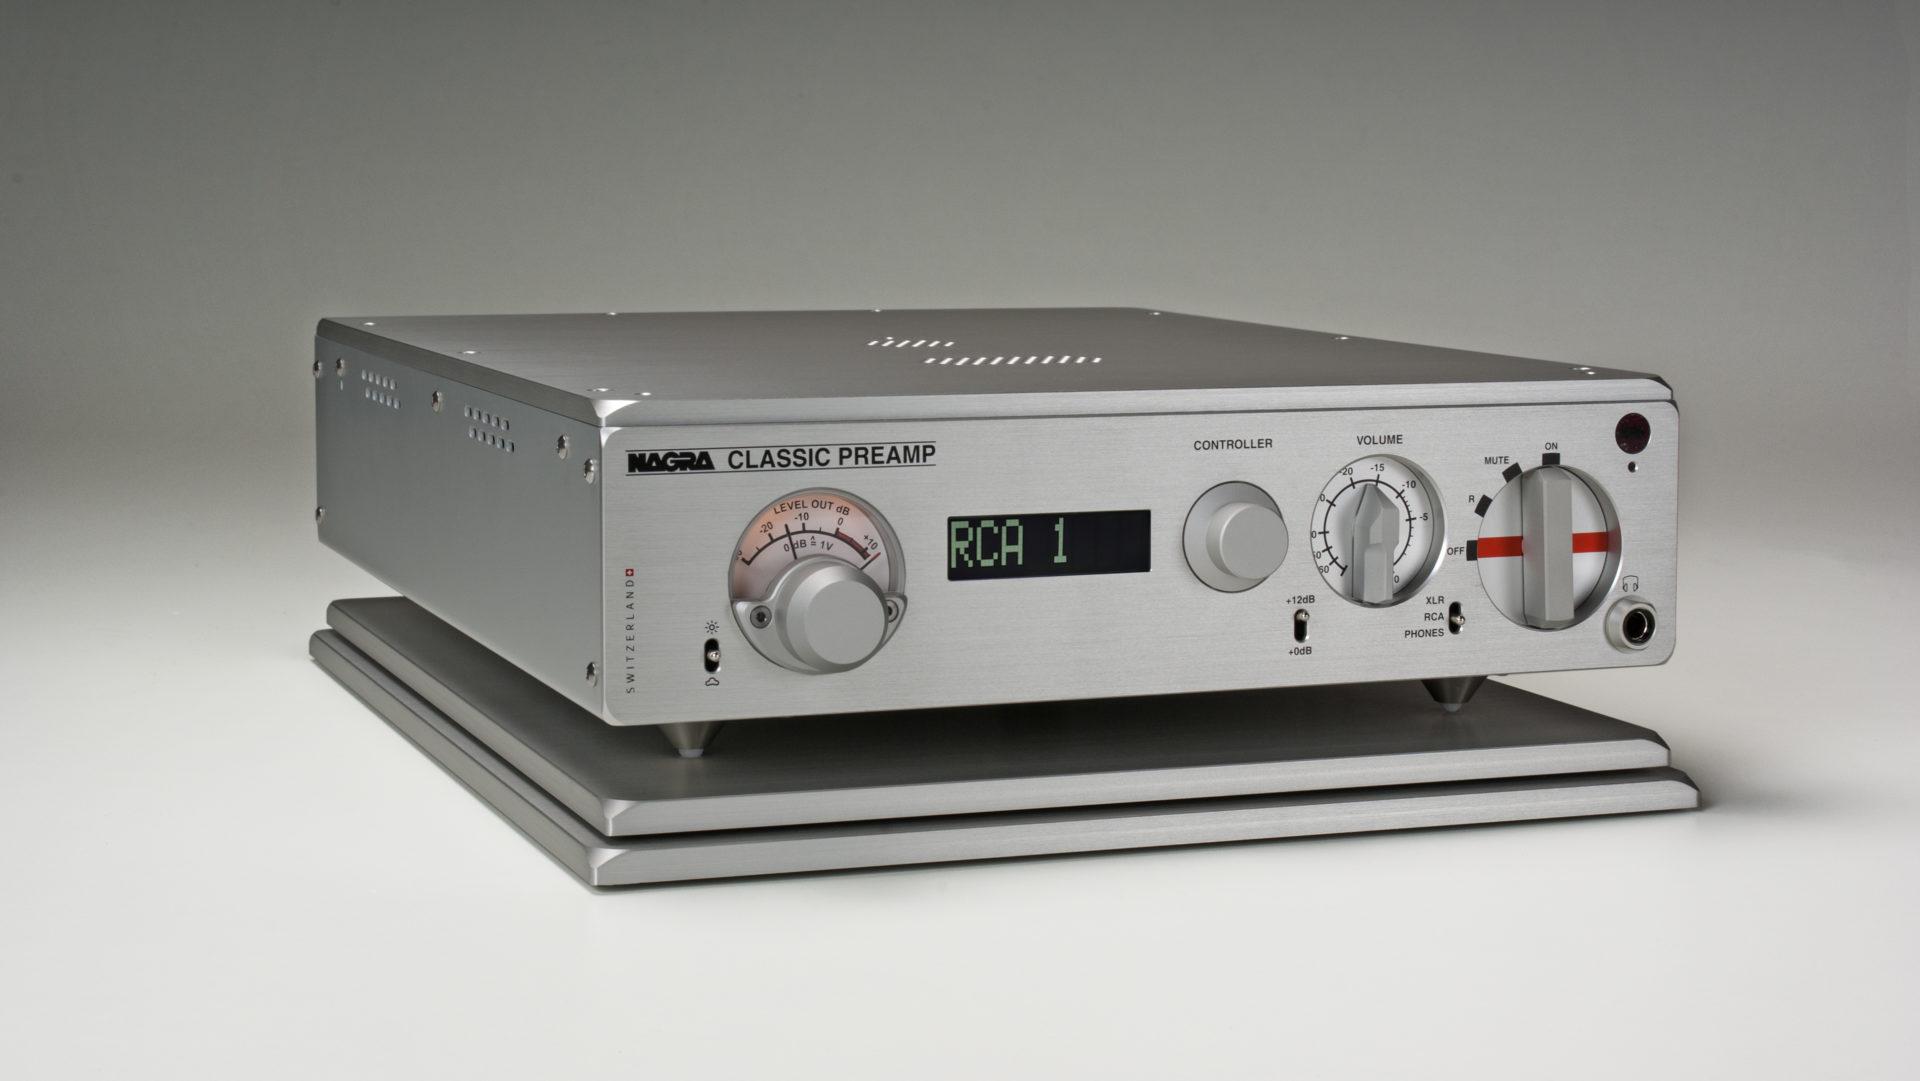 Nagra Classic Preamp preamplifier tube best modulometer vfs front